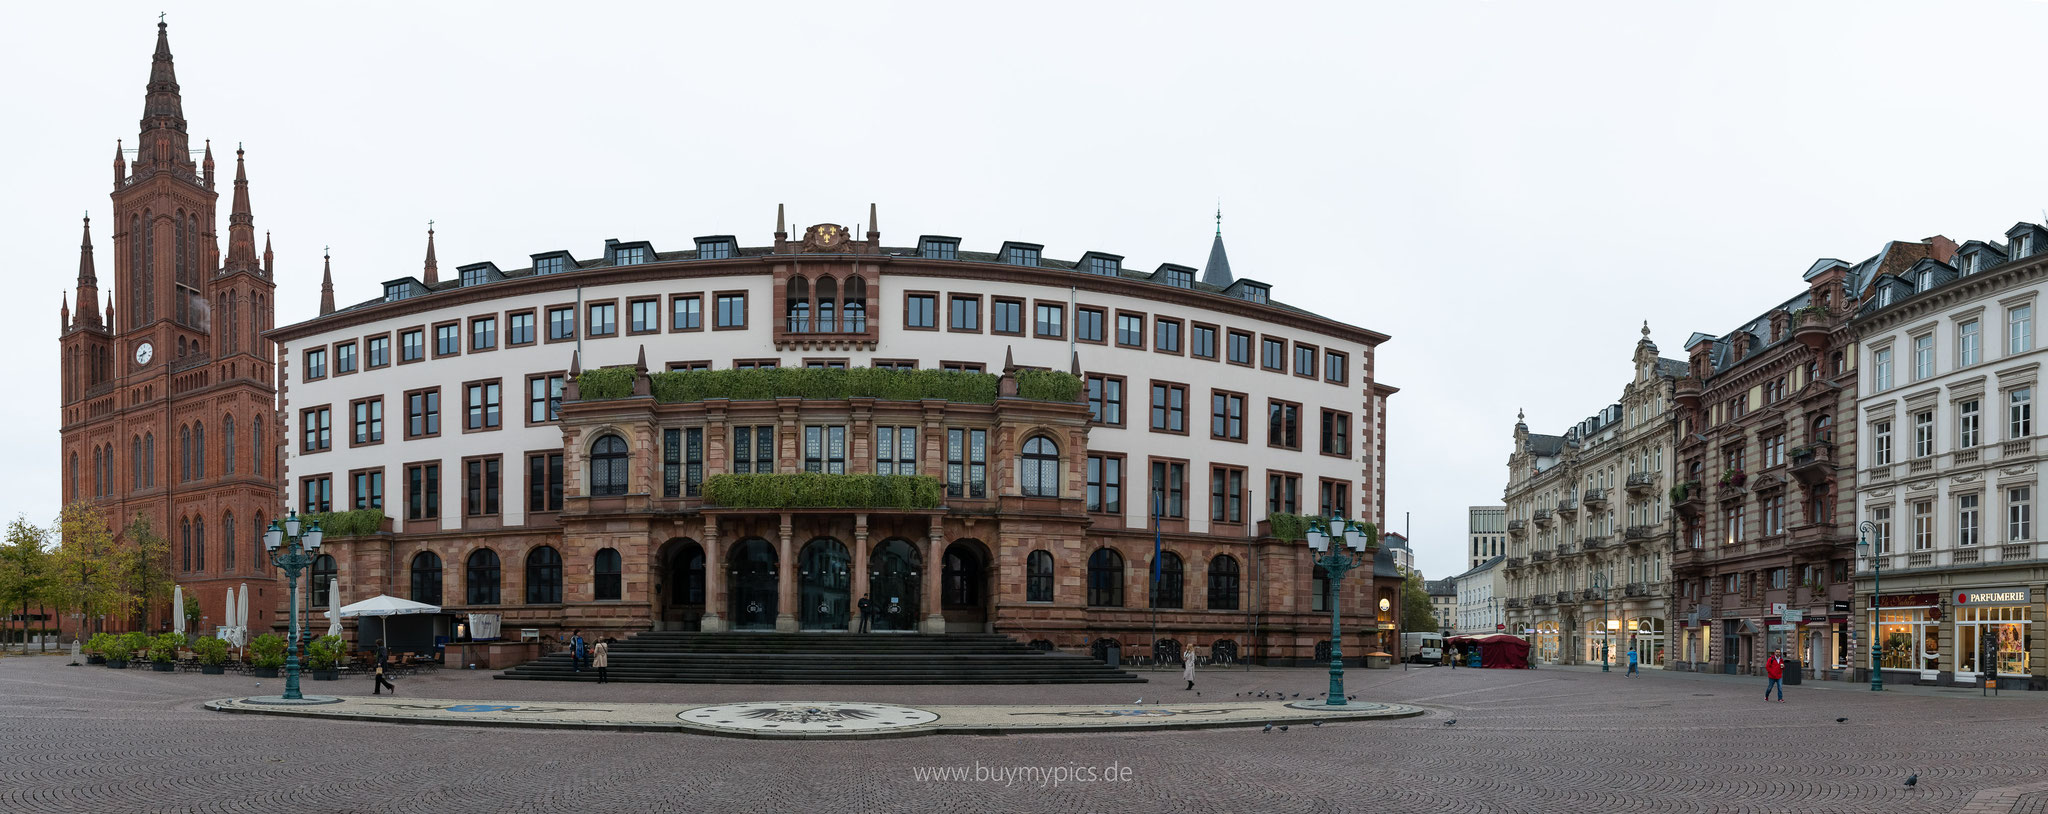 Wiesbadener Platz vor dem Standesamt